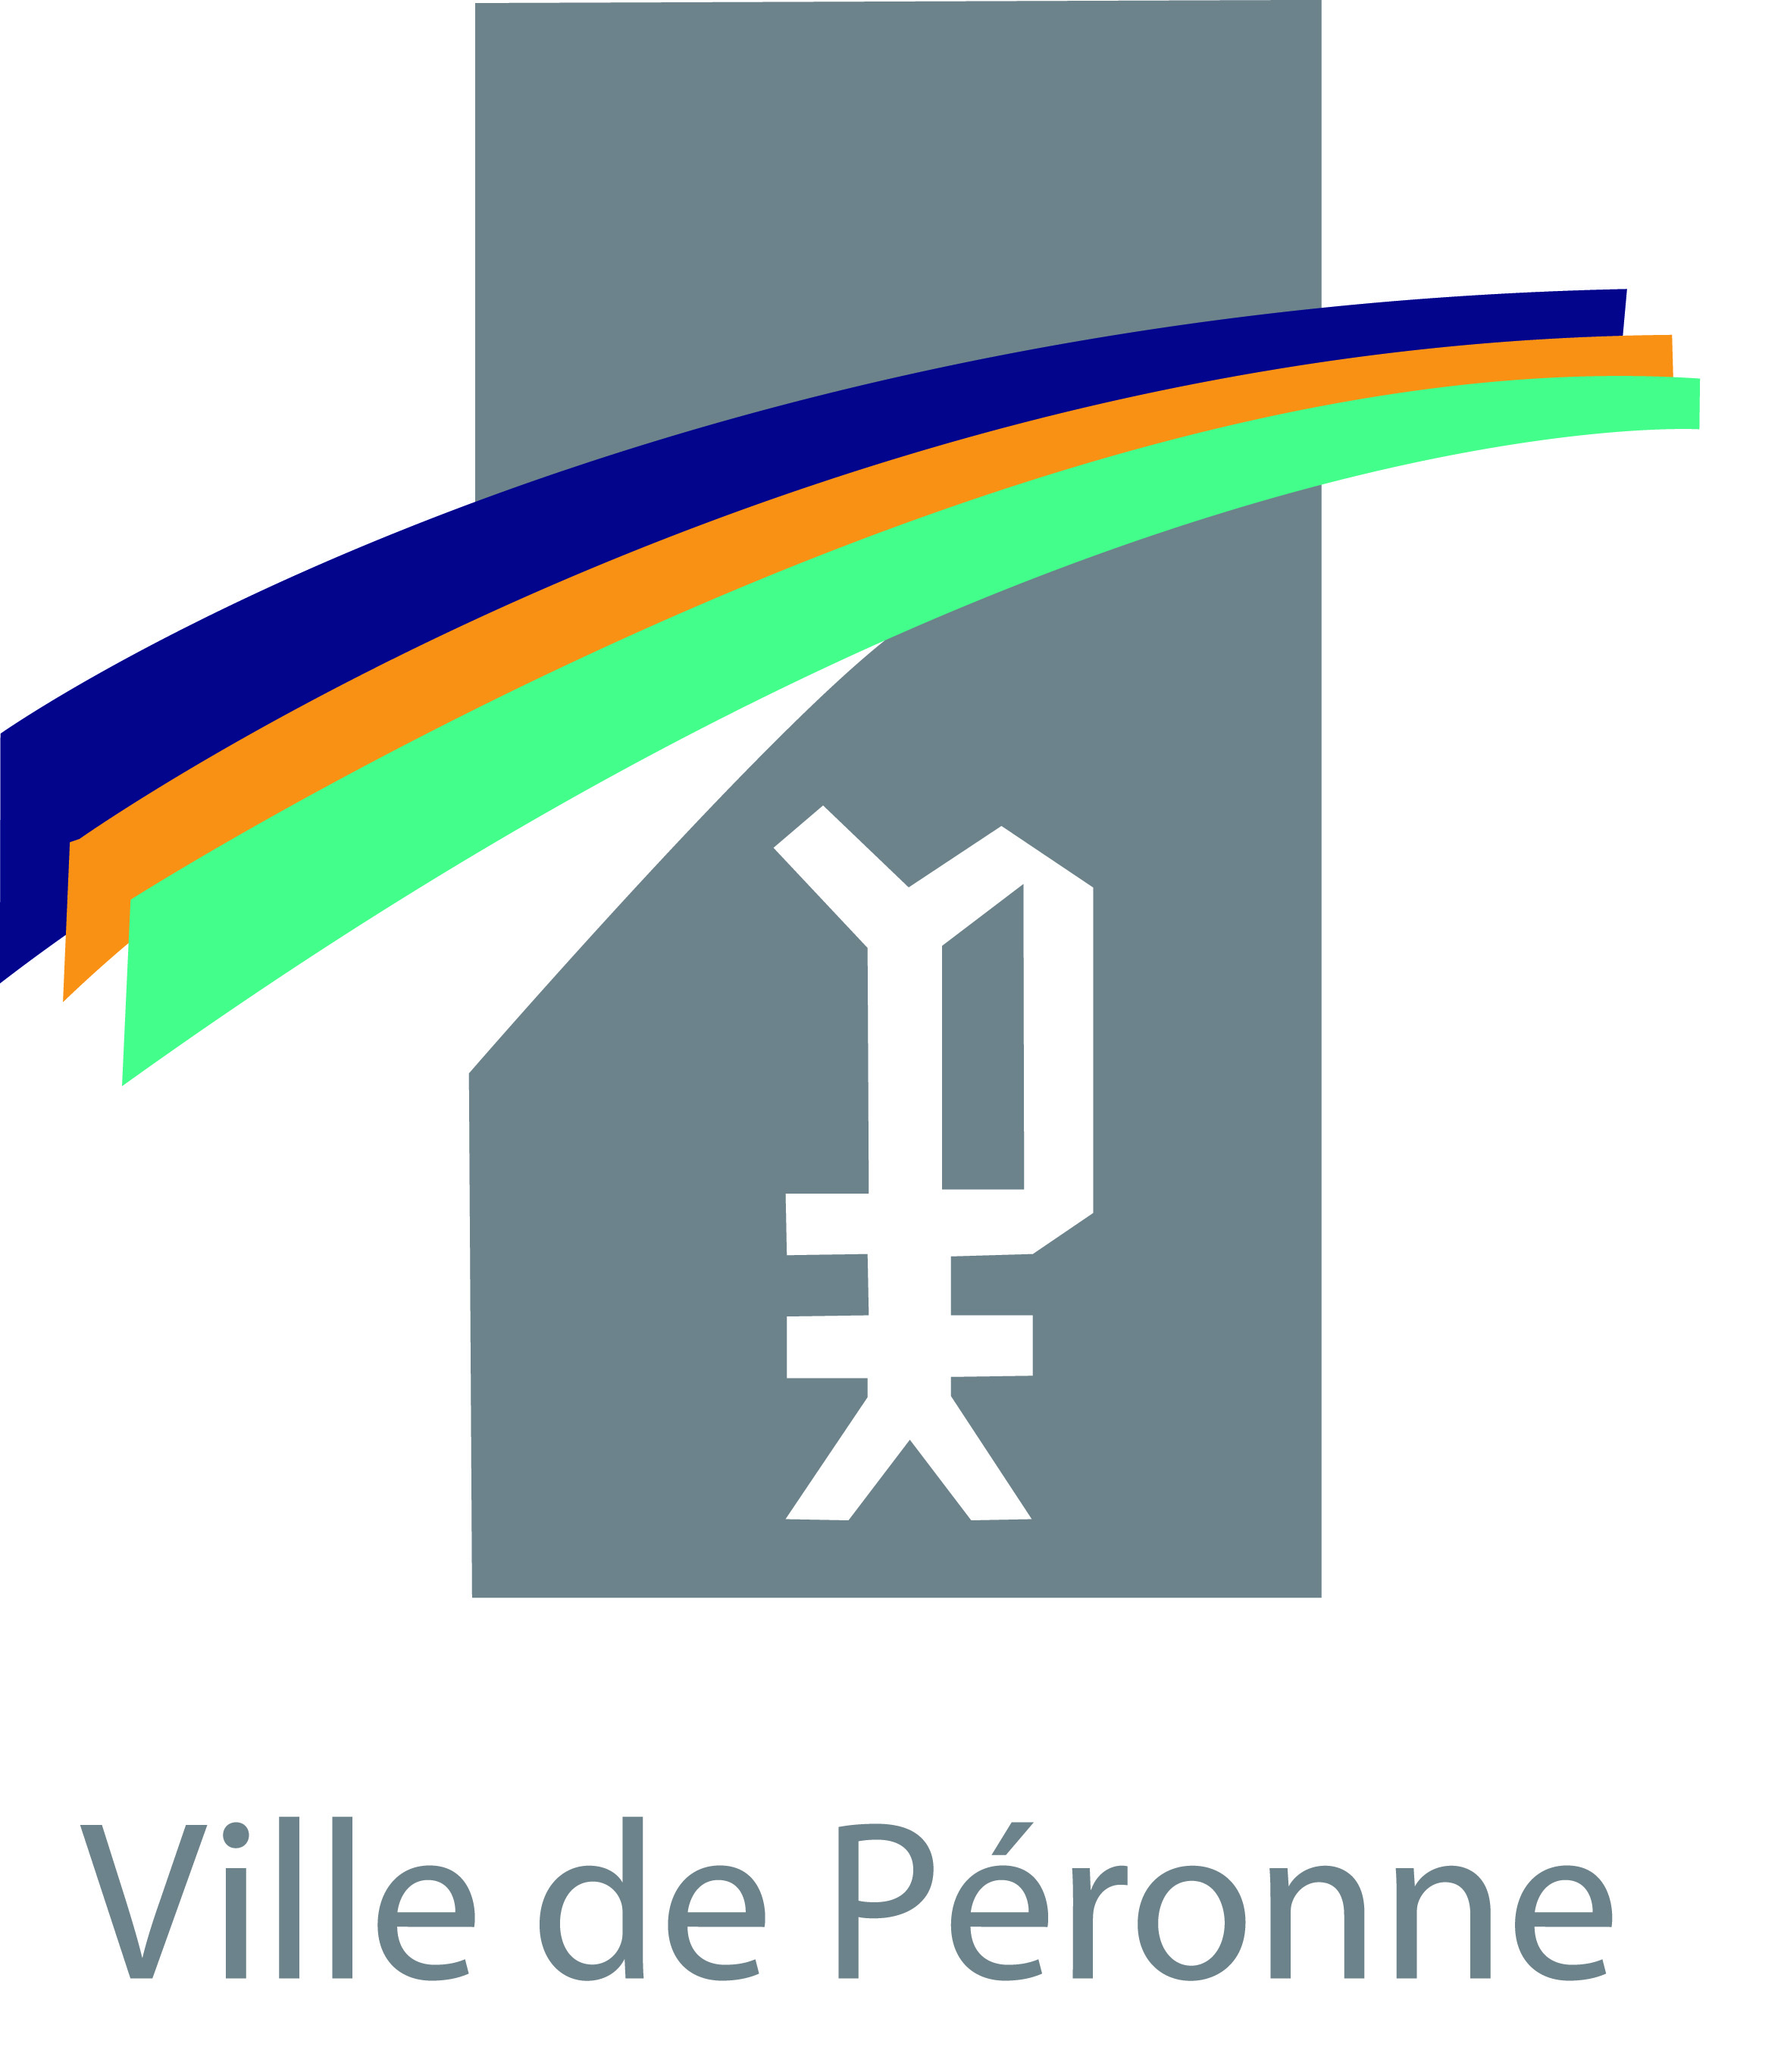 Ville de Péronne - Fond blanc.jpg